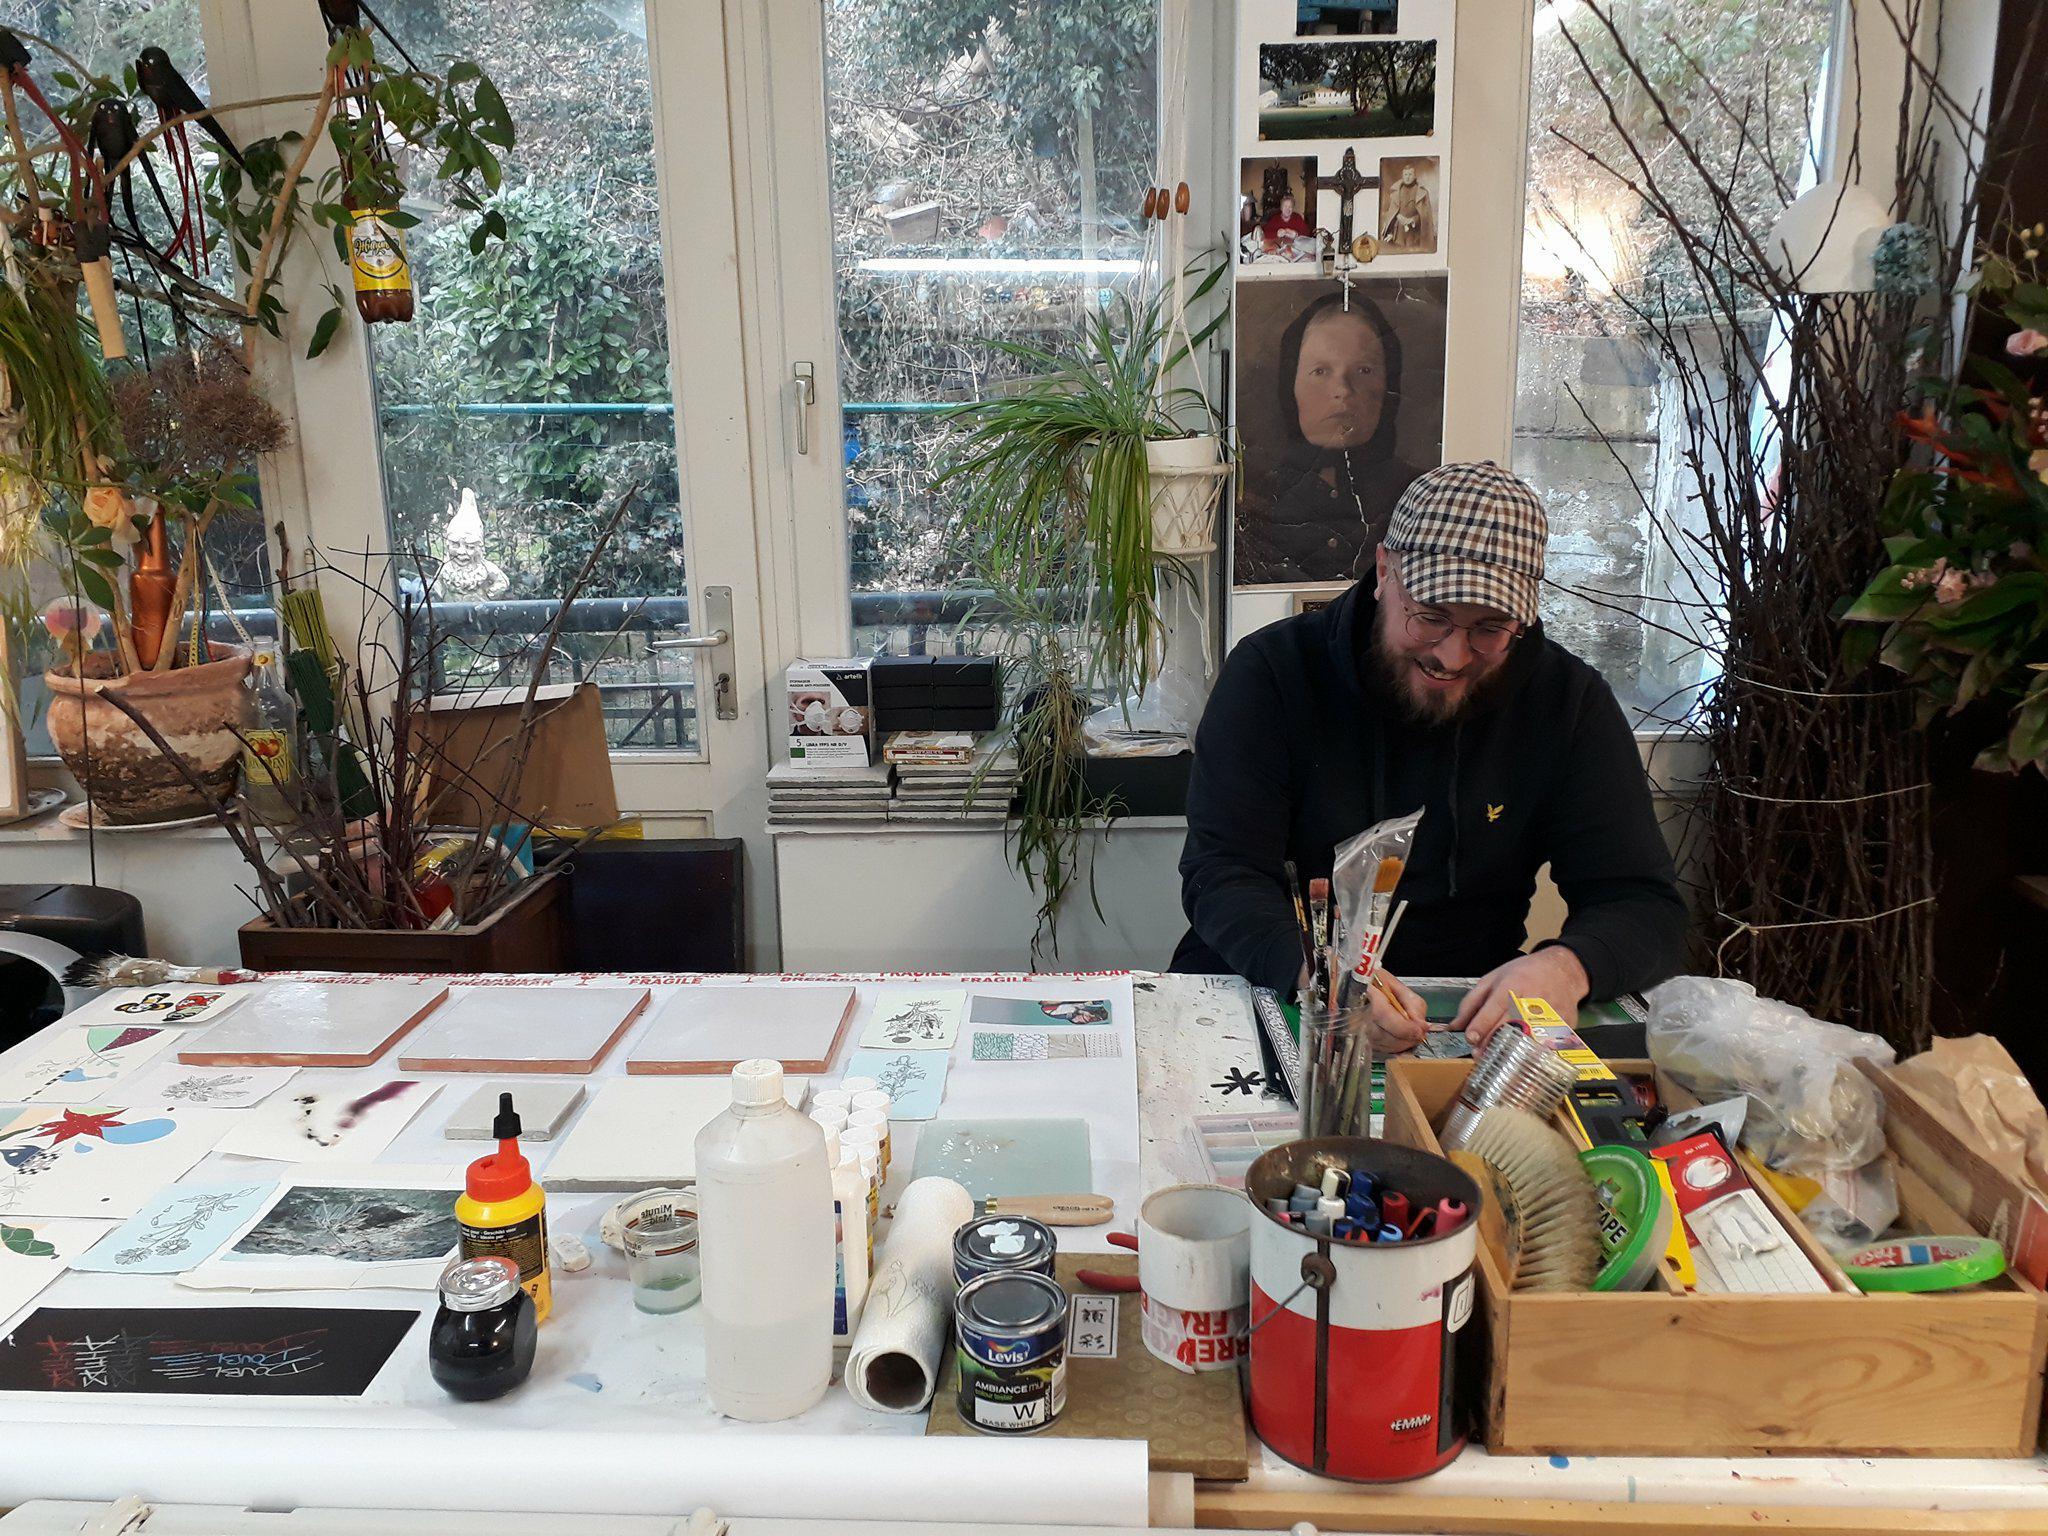 Marcin Sobolev in his workshop ©Hangar photo